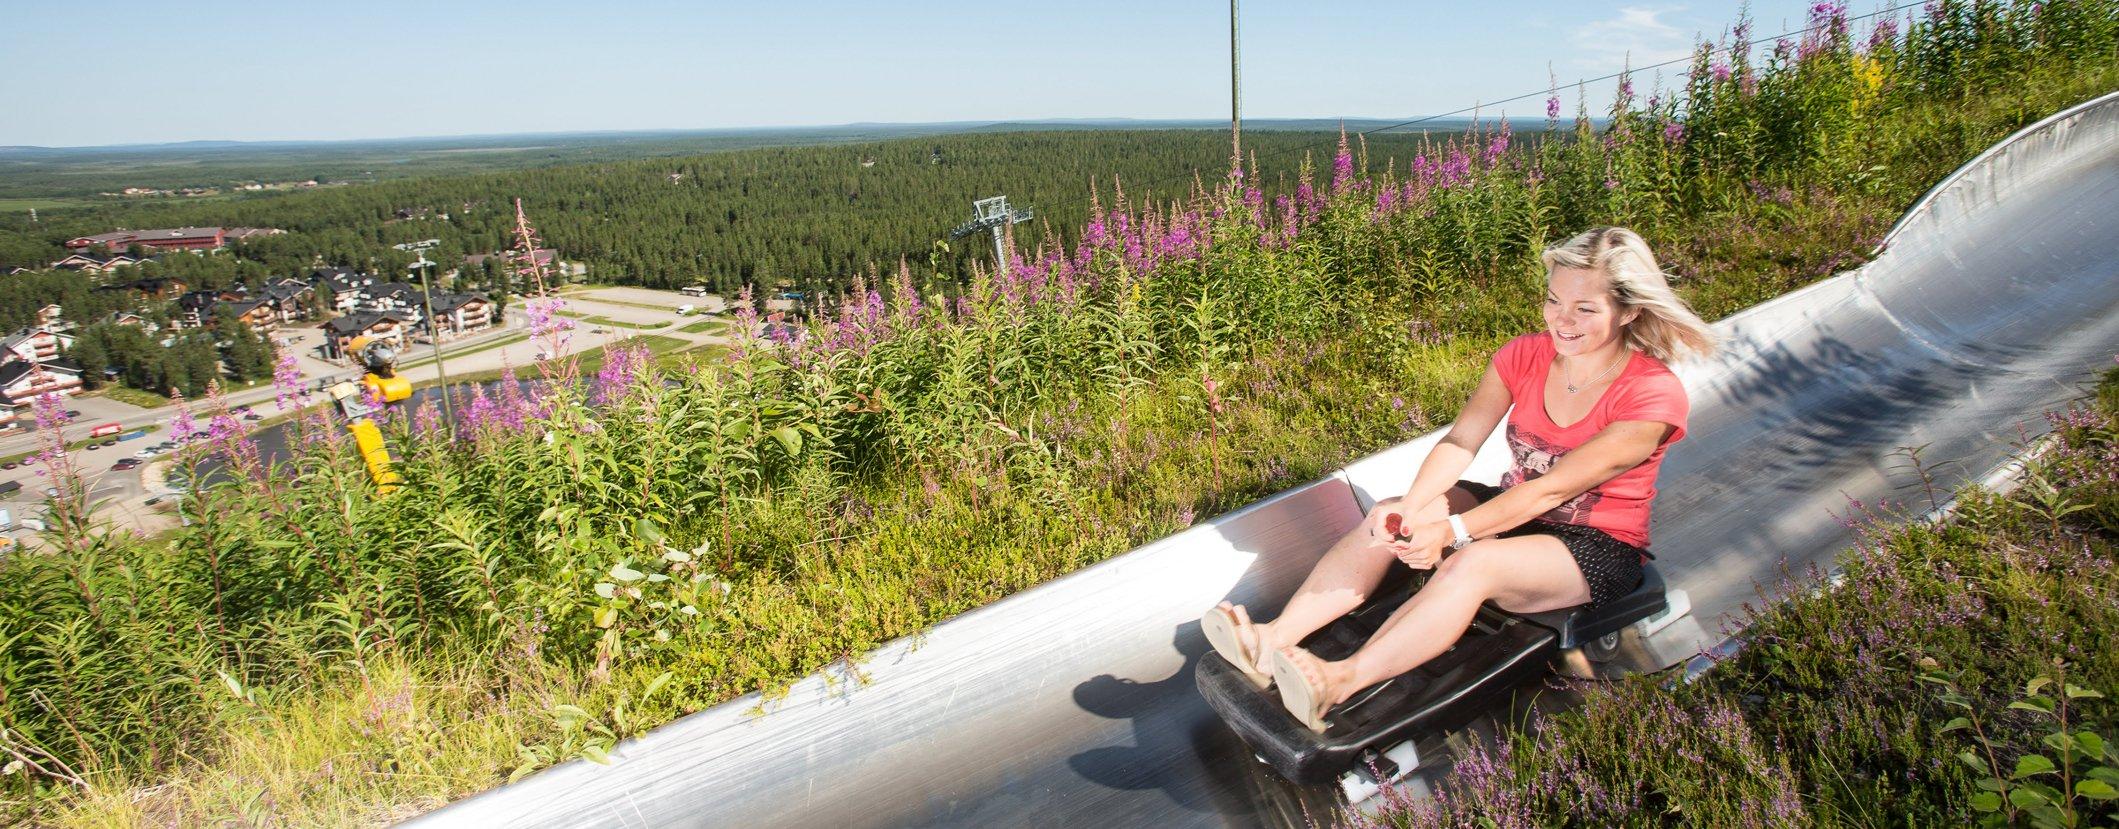 Levi_summer_sledding